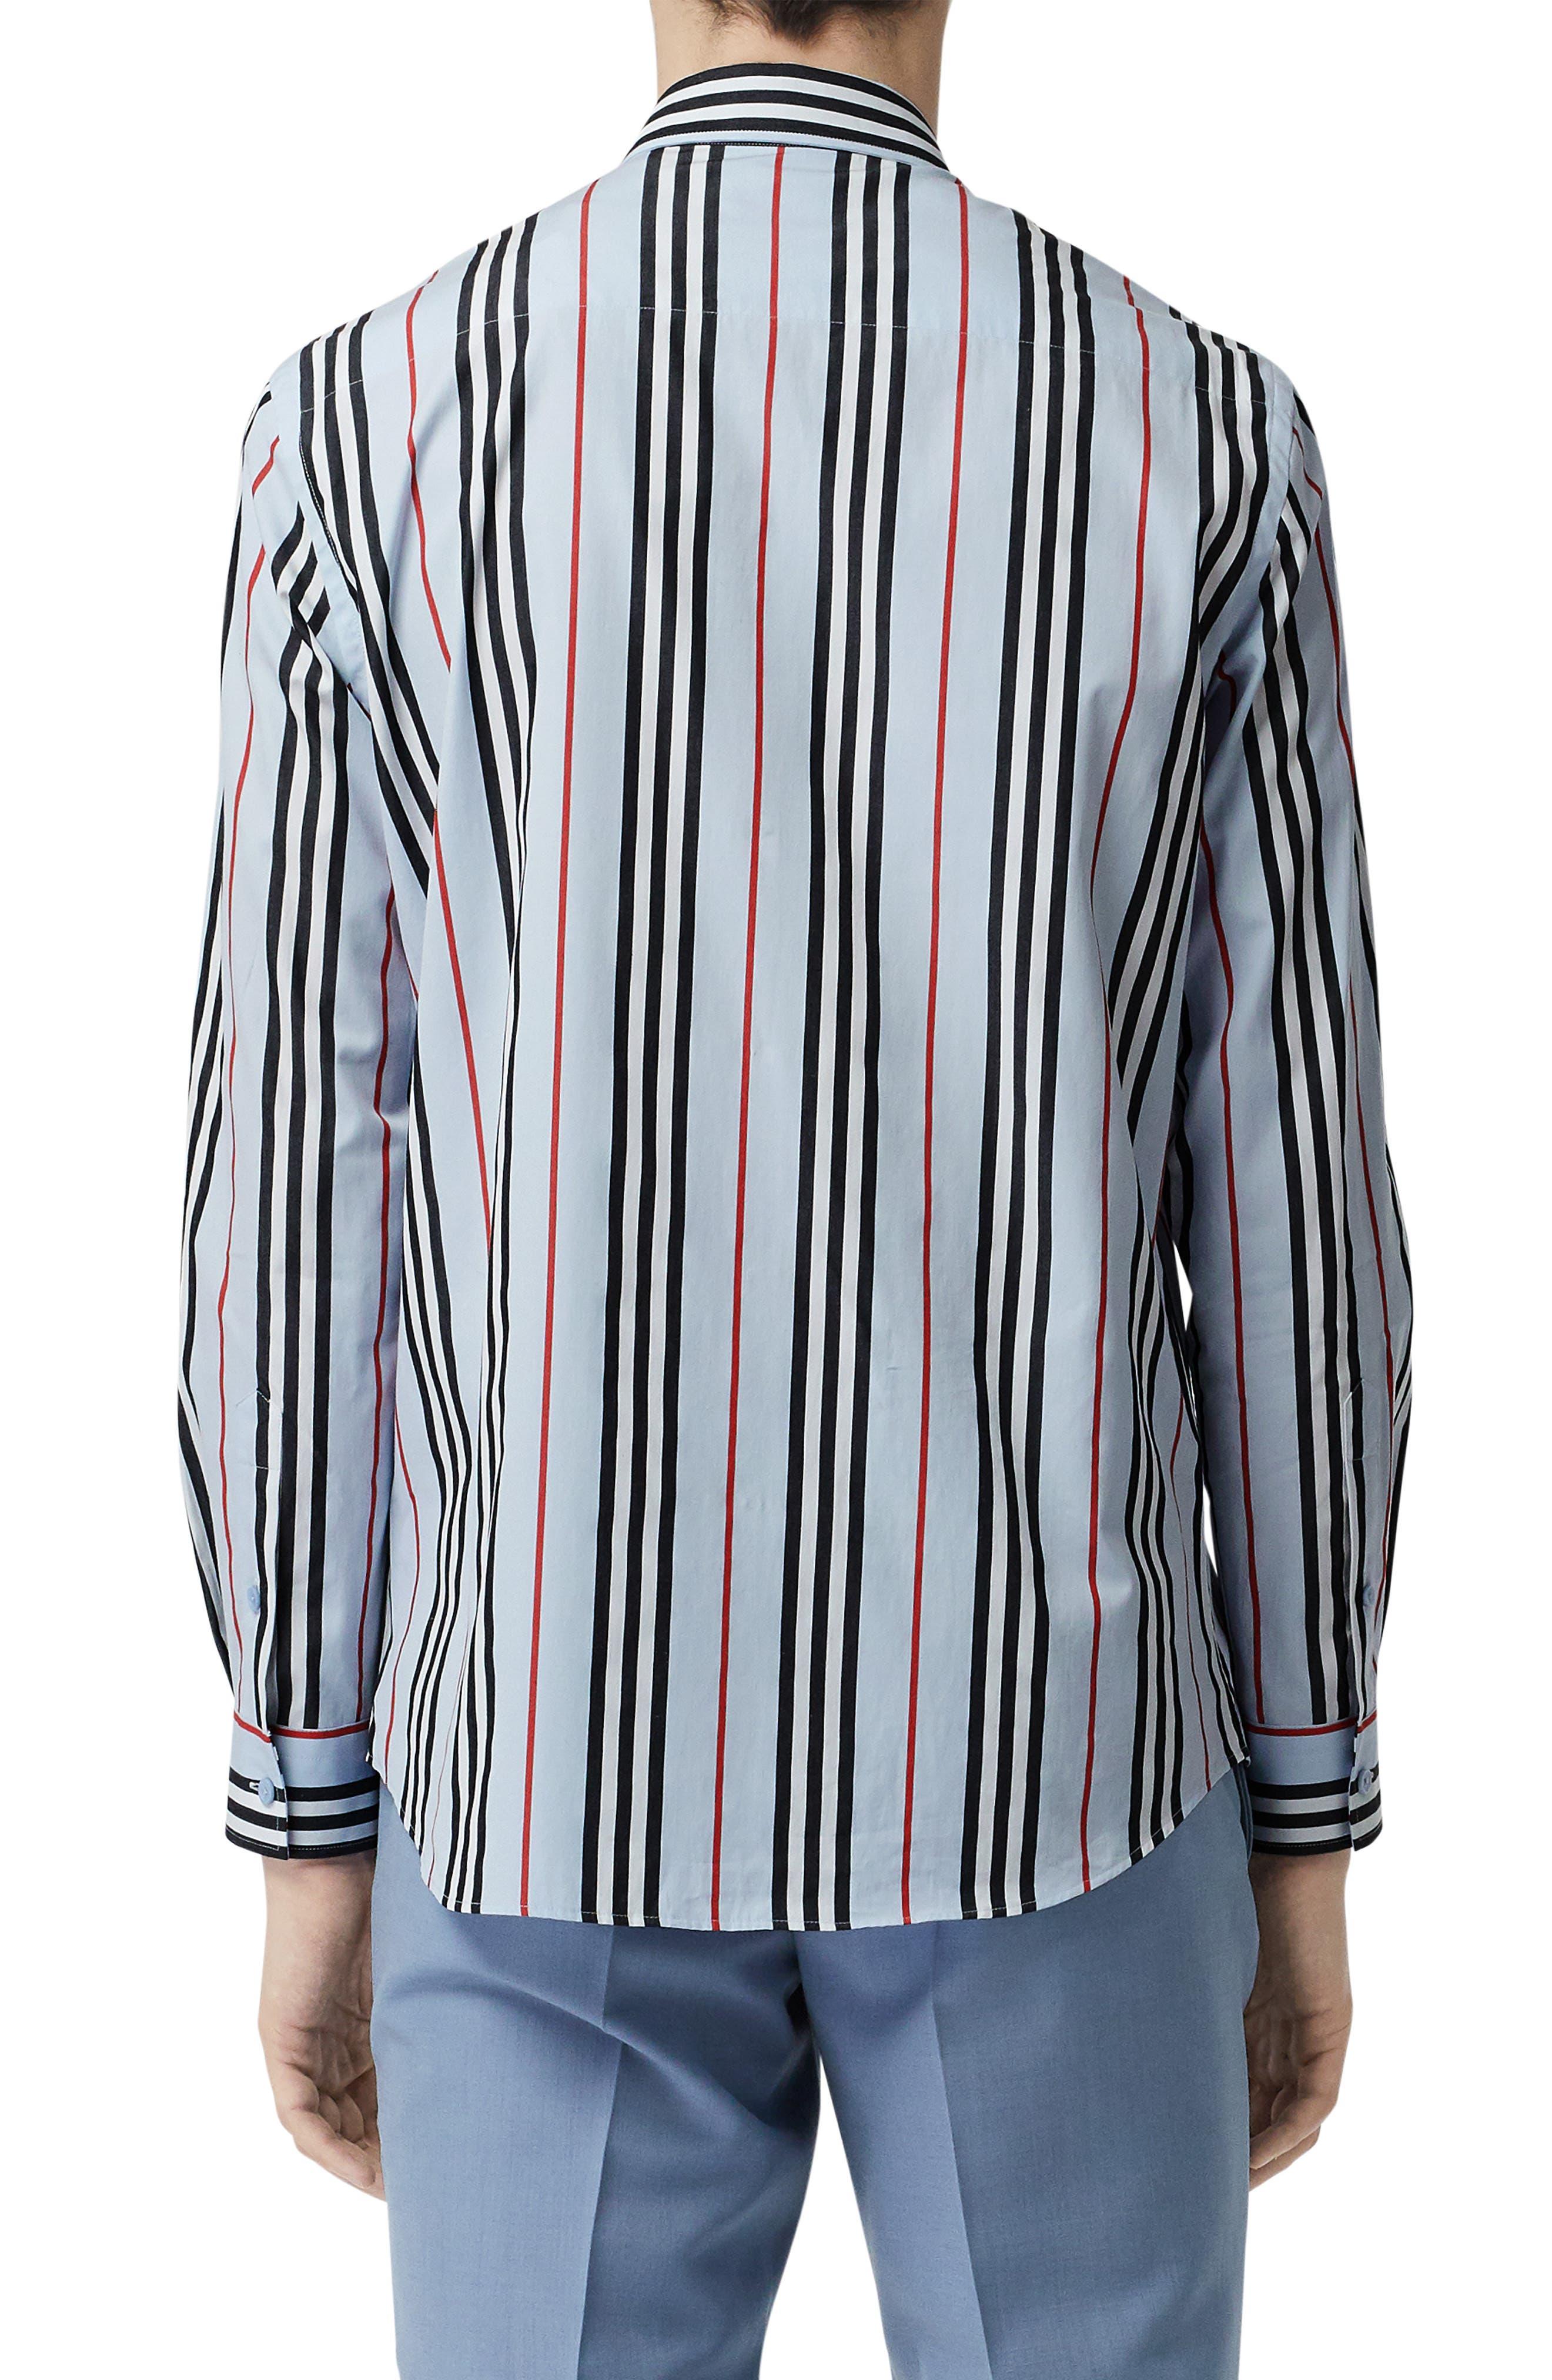 BURBERRY, Icon Stripe Shirt, Alternate thumbnail 3, color, PALE BLUE